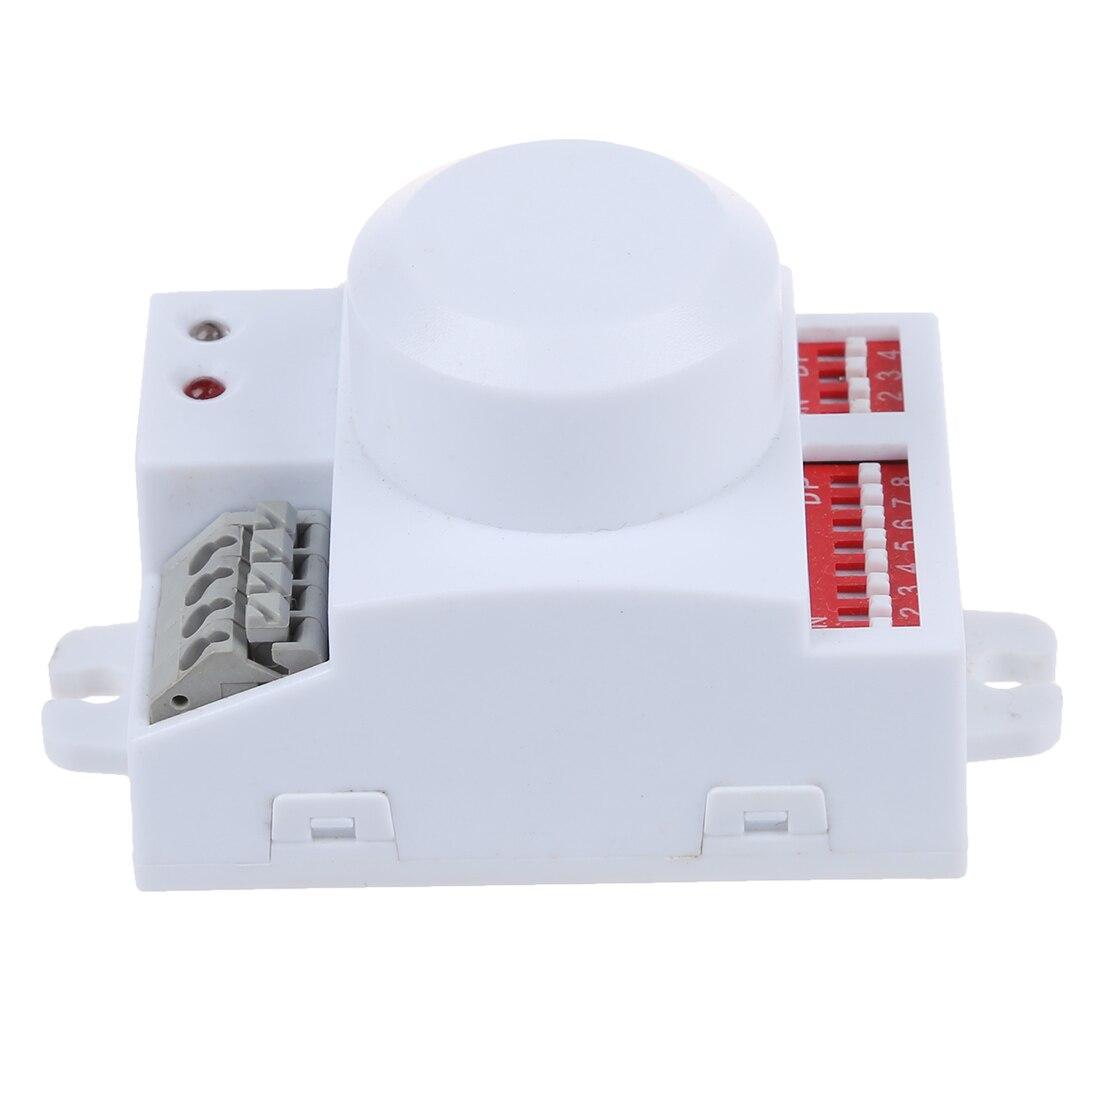 все цены на EWS Microwave motion sensor switch Doppler Radar Wireless Module for lighting 220V - White онлайн